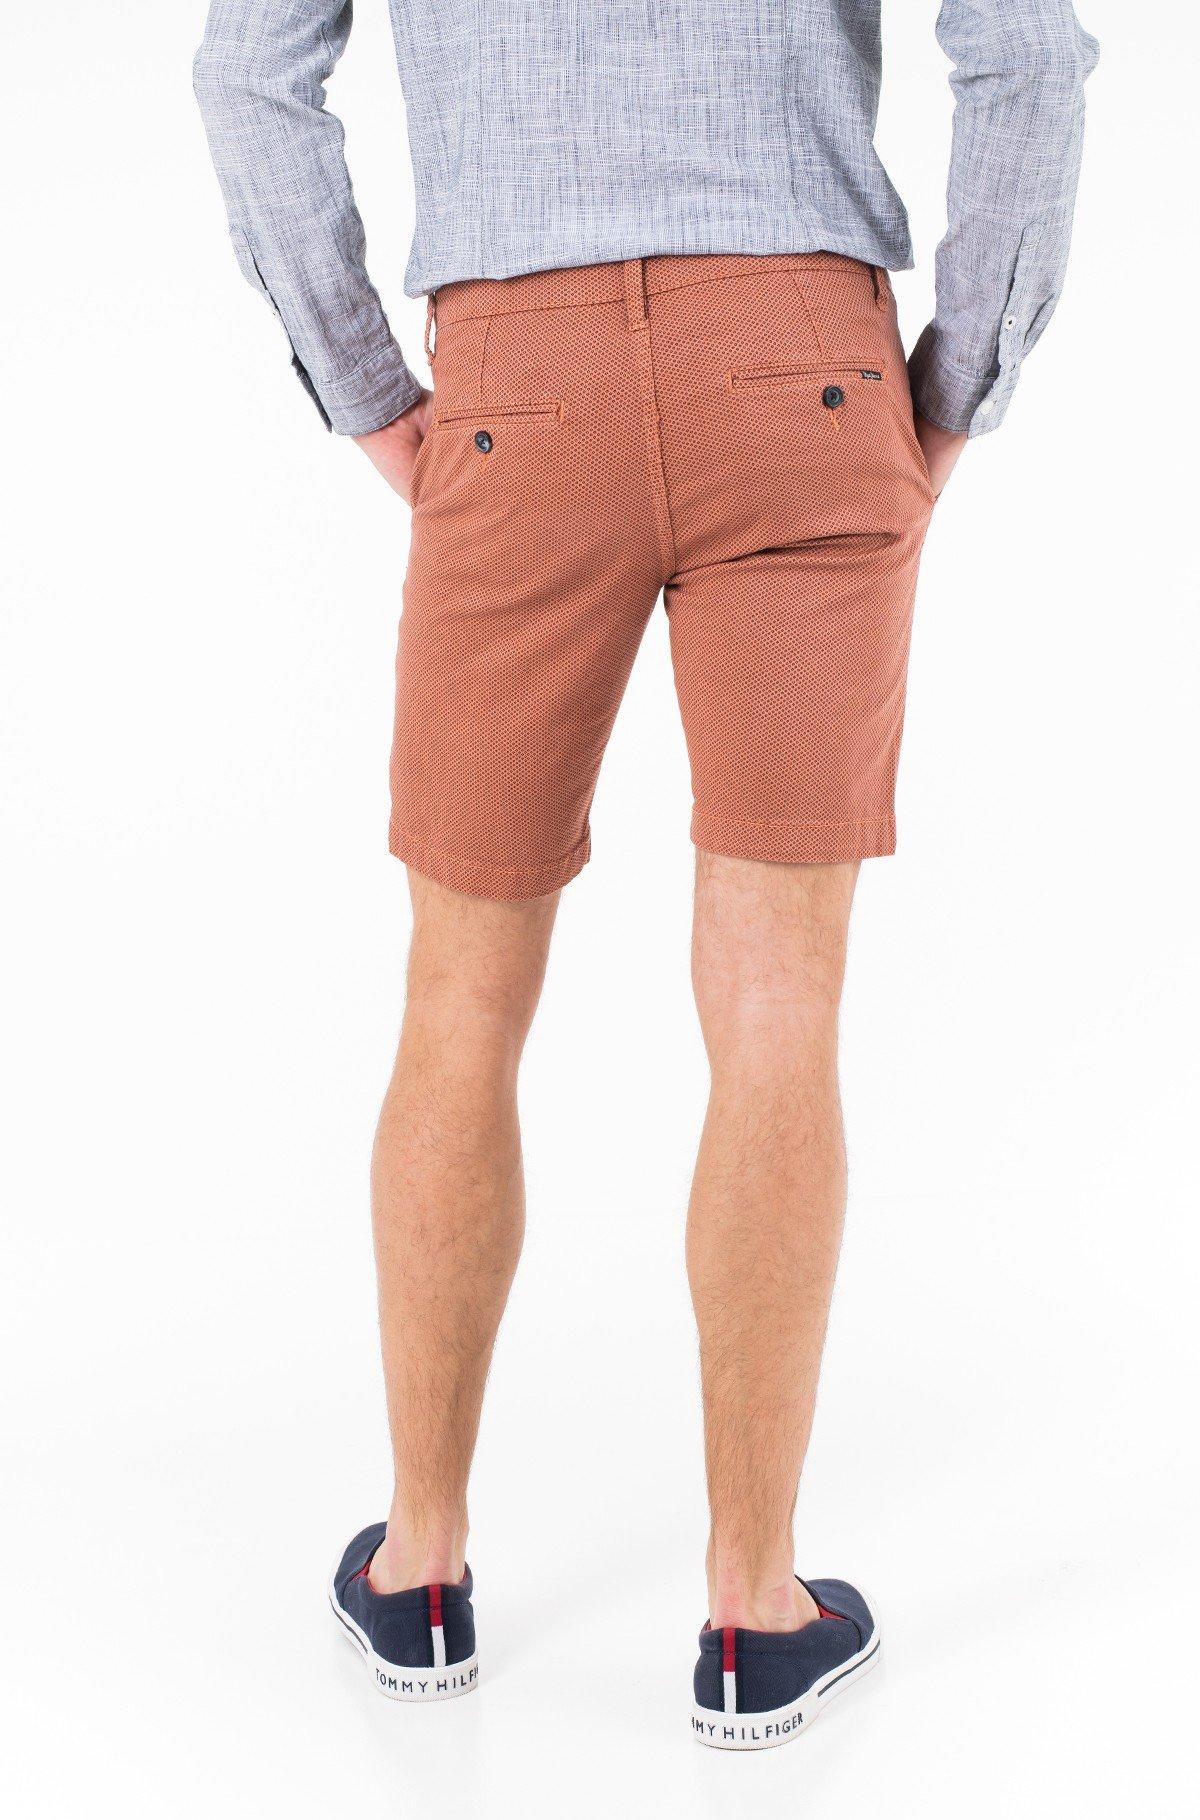 Shorts CHARLY SHORT MIRCO/PM800717-full-2